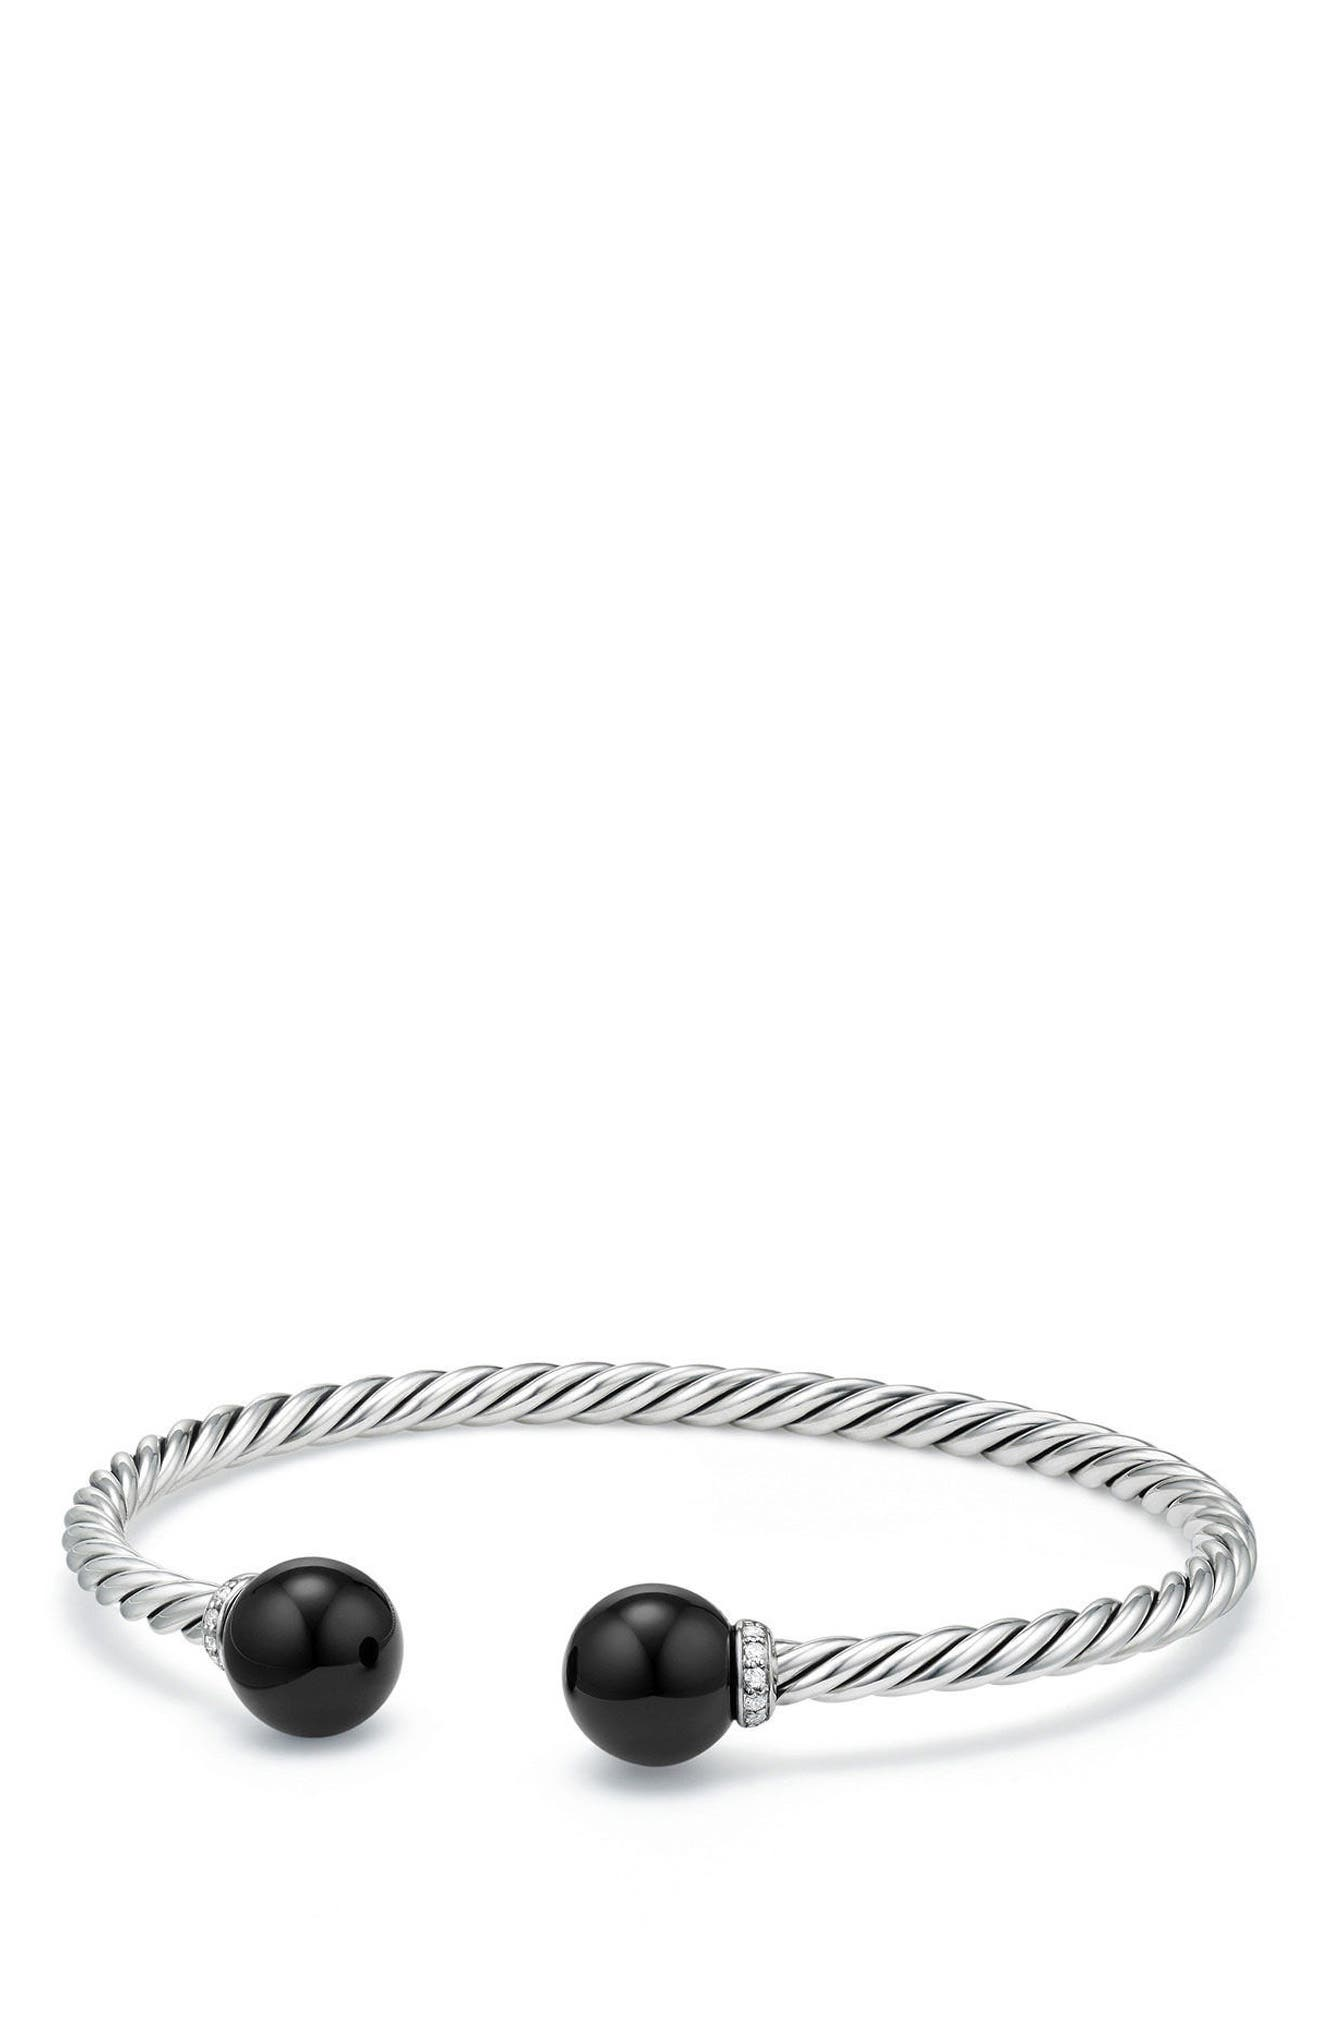 DAVID YURMAN, Solari Bead Bracelet with Diamonds, Main thumbnail 1, color, SILVER/ DIAMOND/ BLACK ONYX